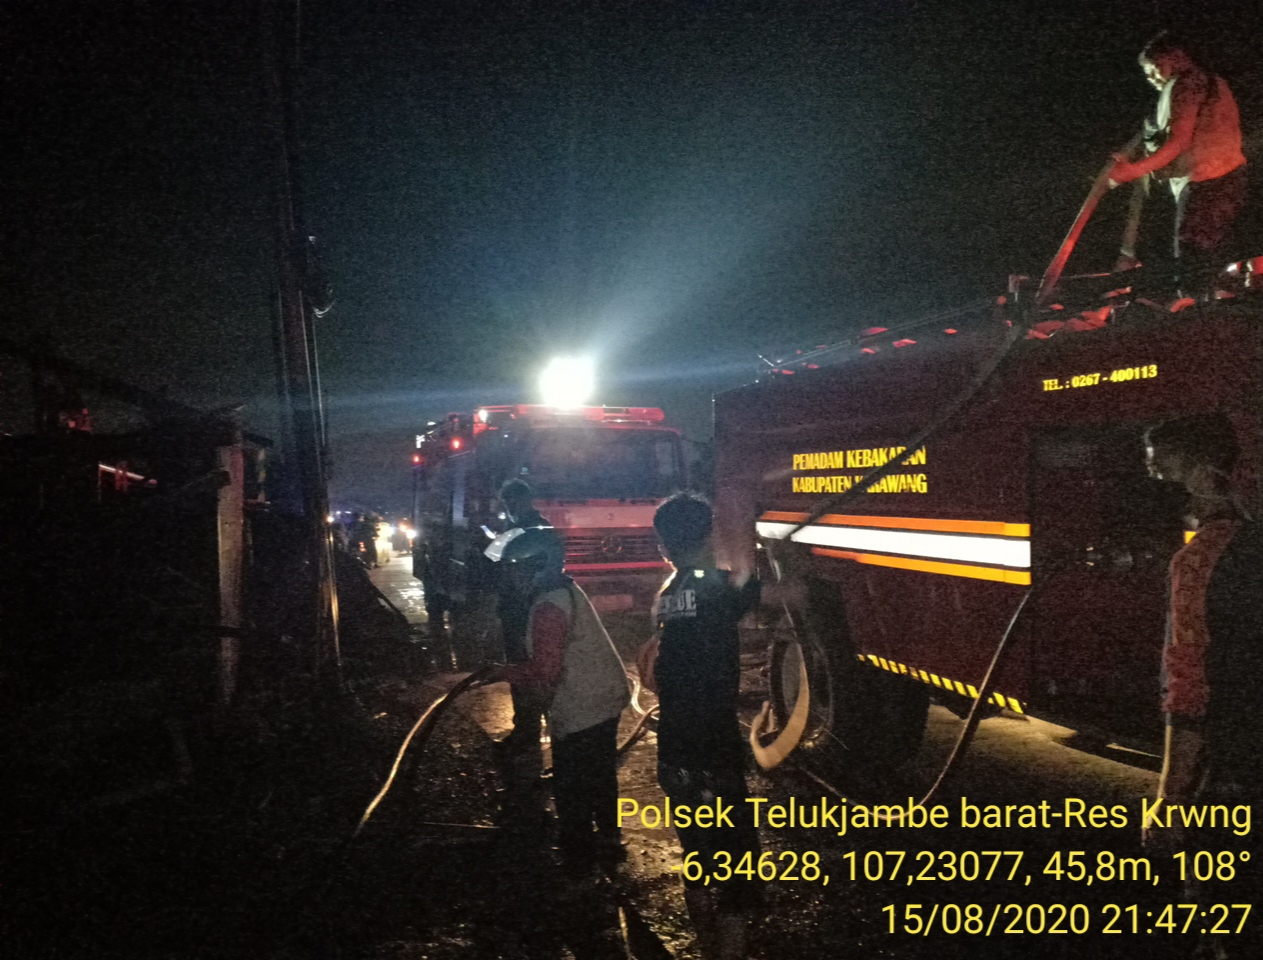 Rumah Cafe Milik Mista Ludes Terbakar Di Kobak Biru